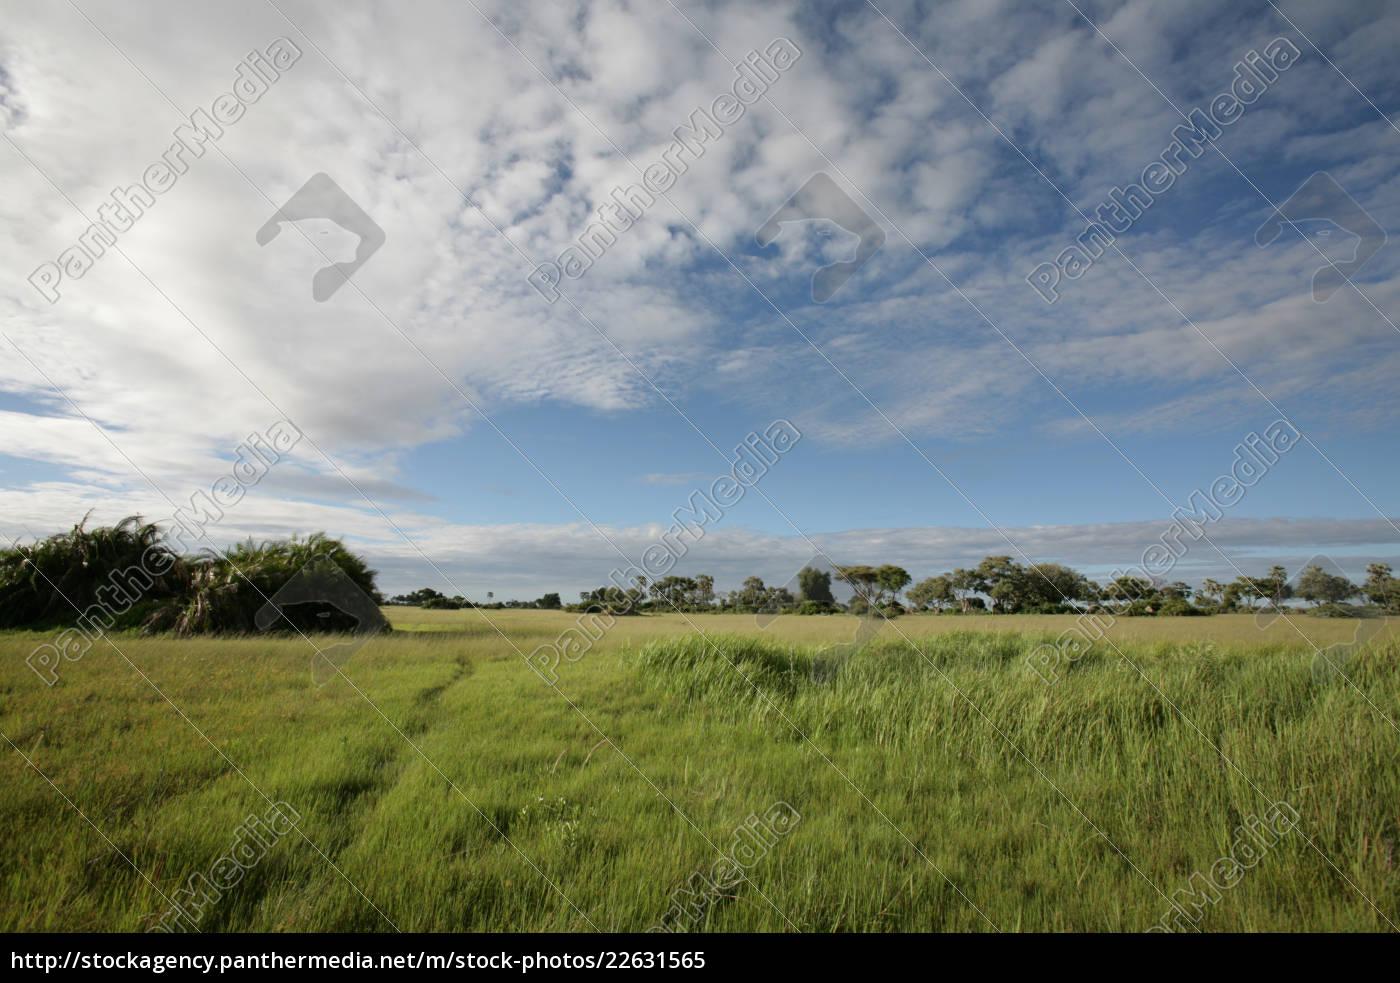 afrikanische, savanne, sommer, pictrures, wilde, safari - 22631565